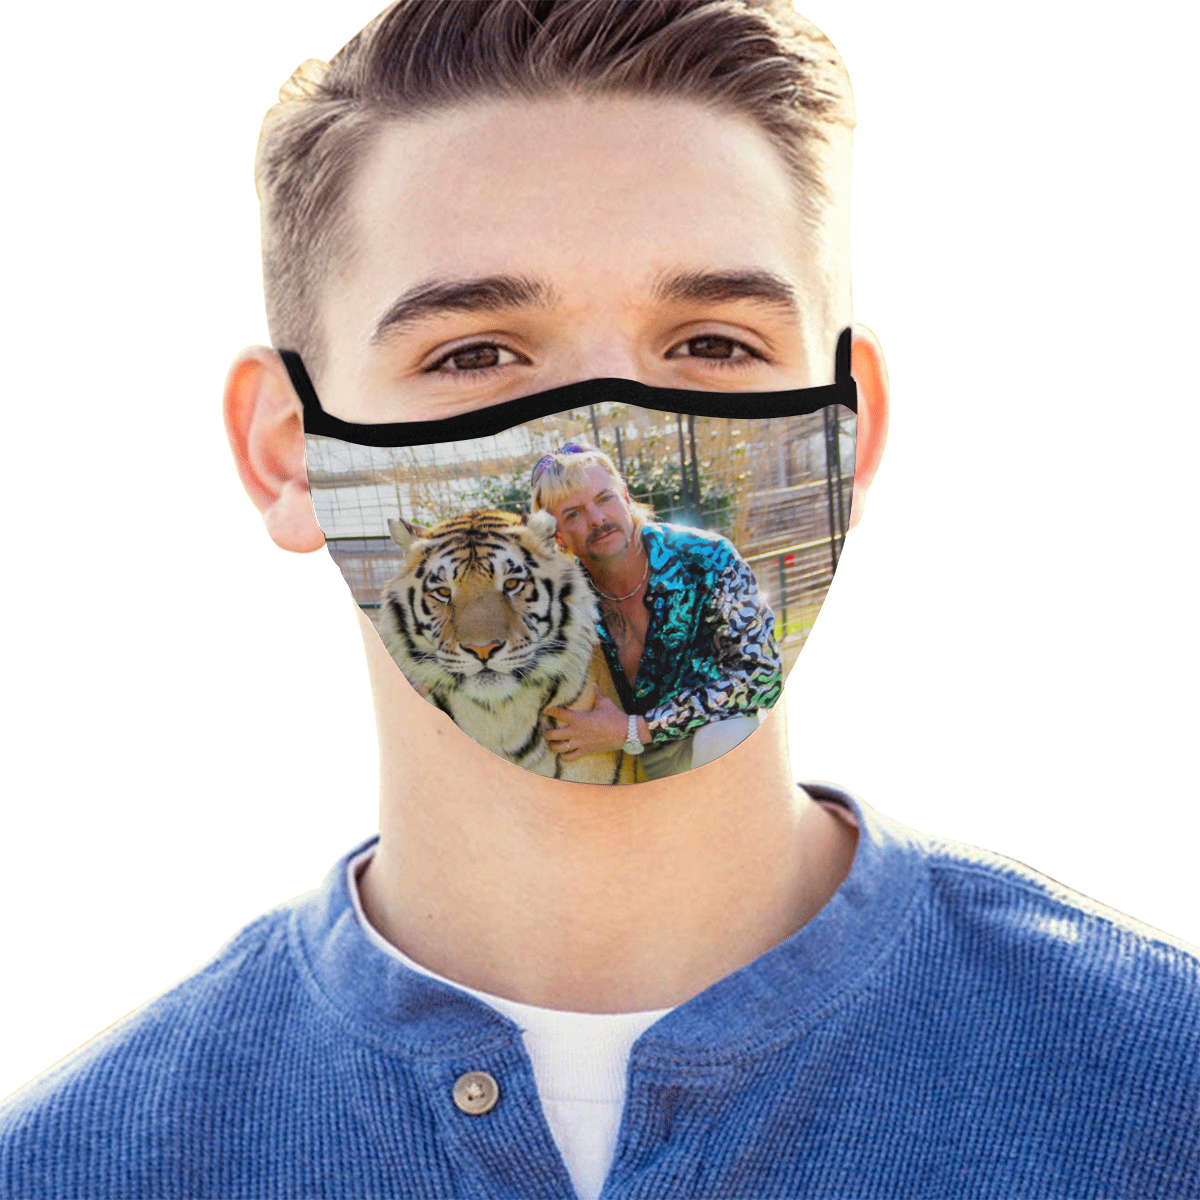 Joe Exotic Face Mask Tiger King Onyx Prints